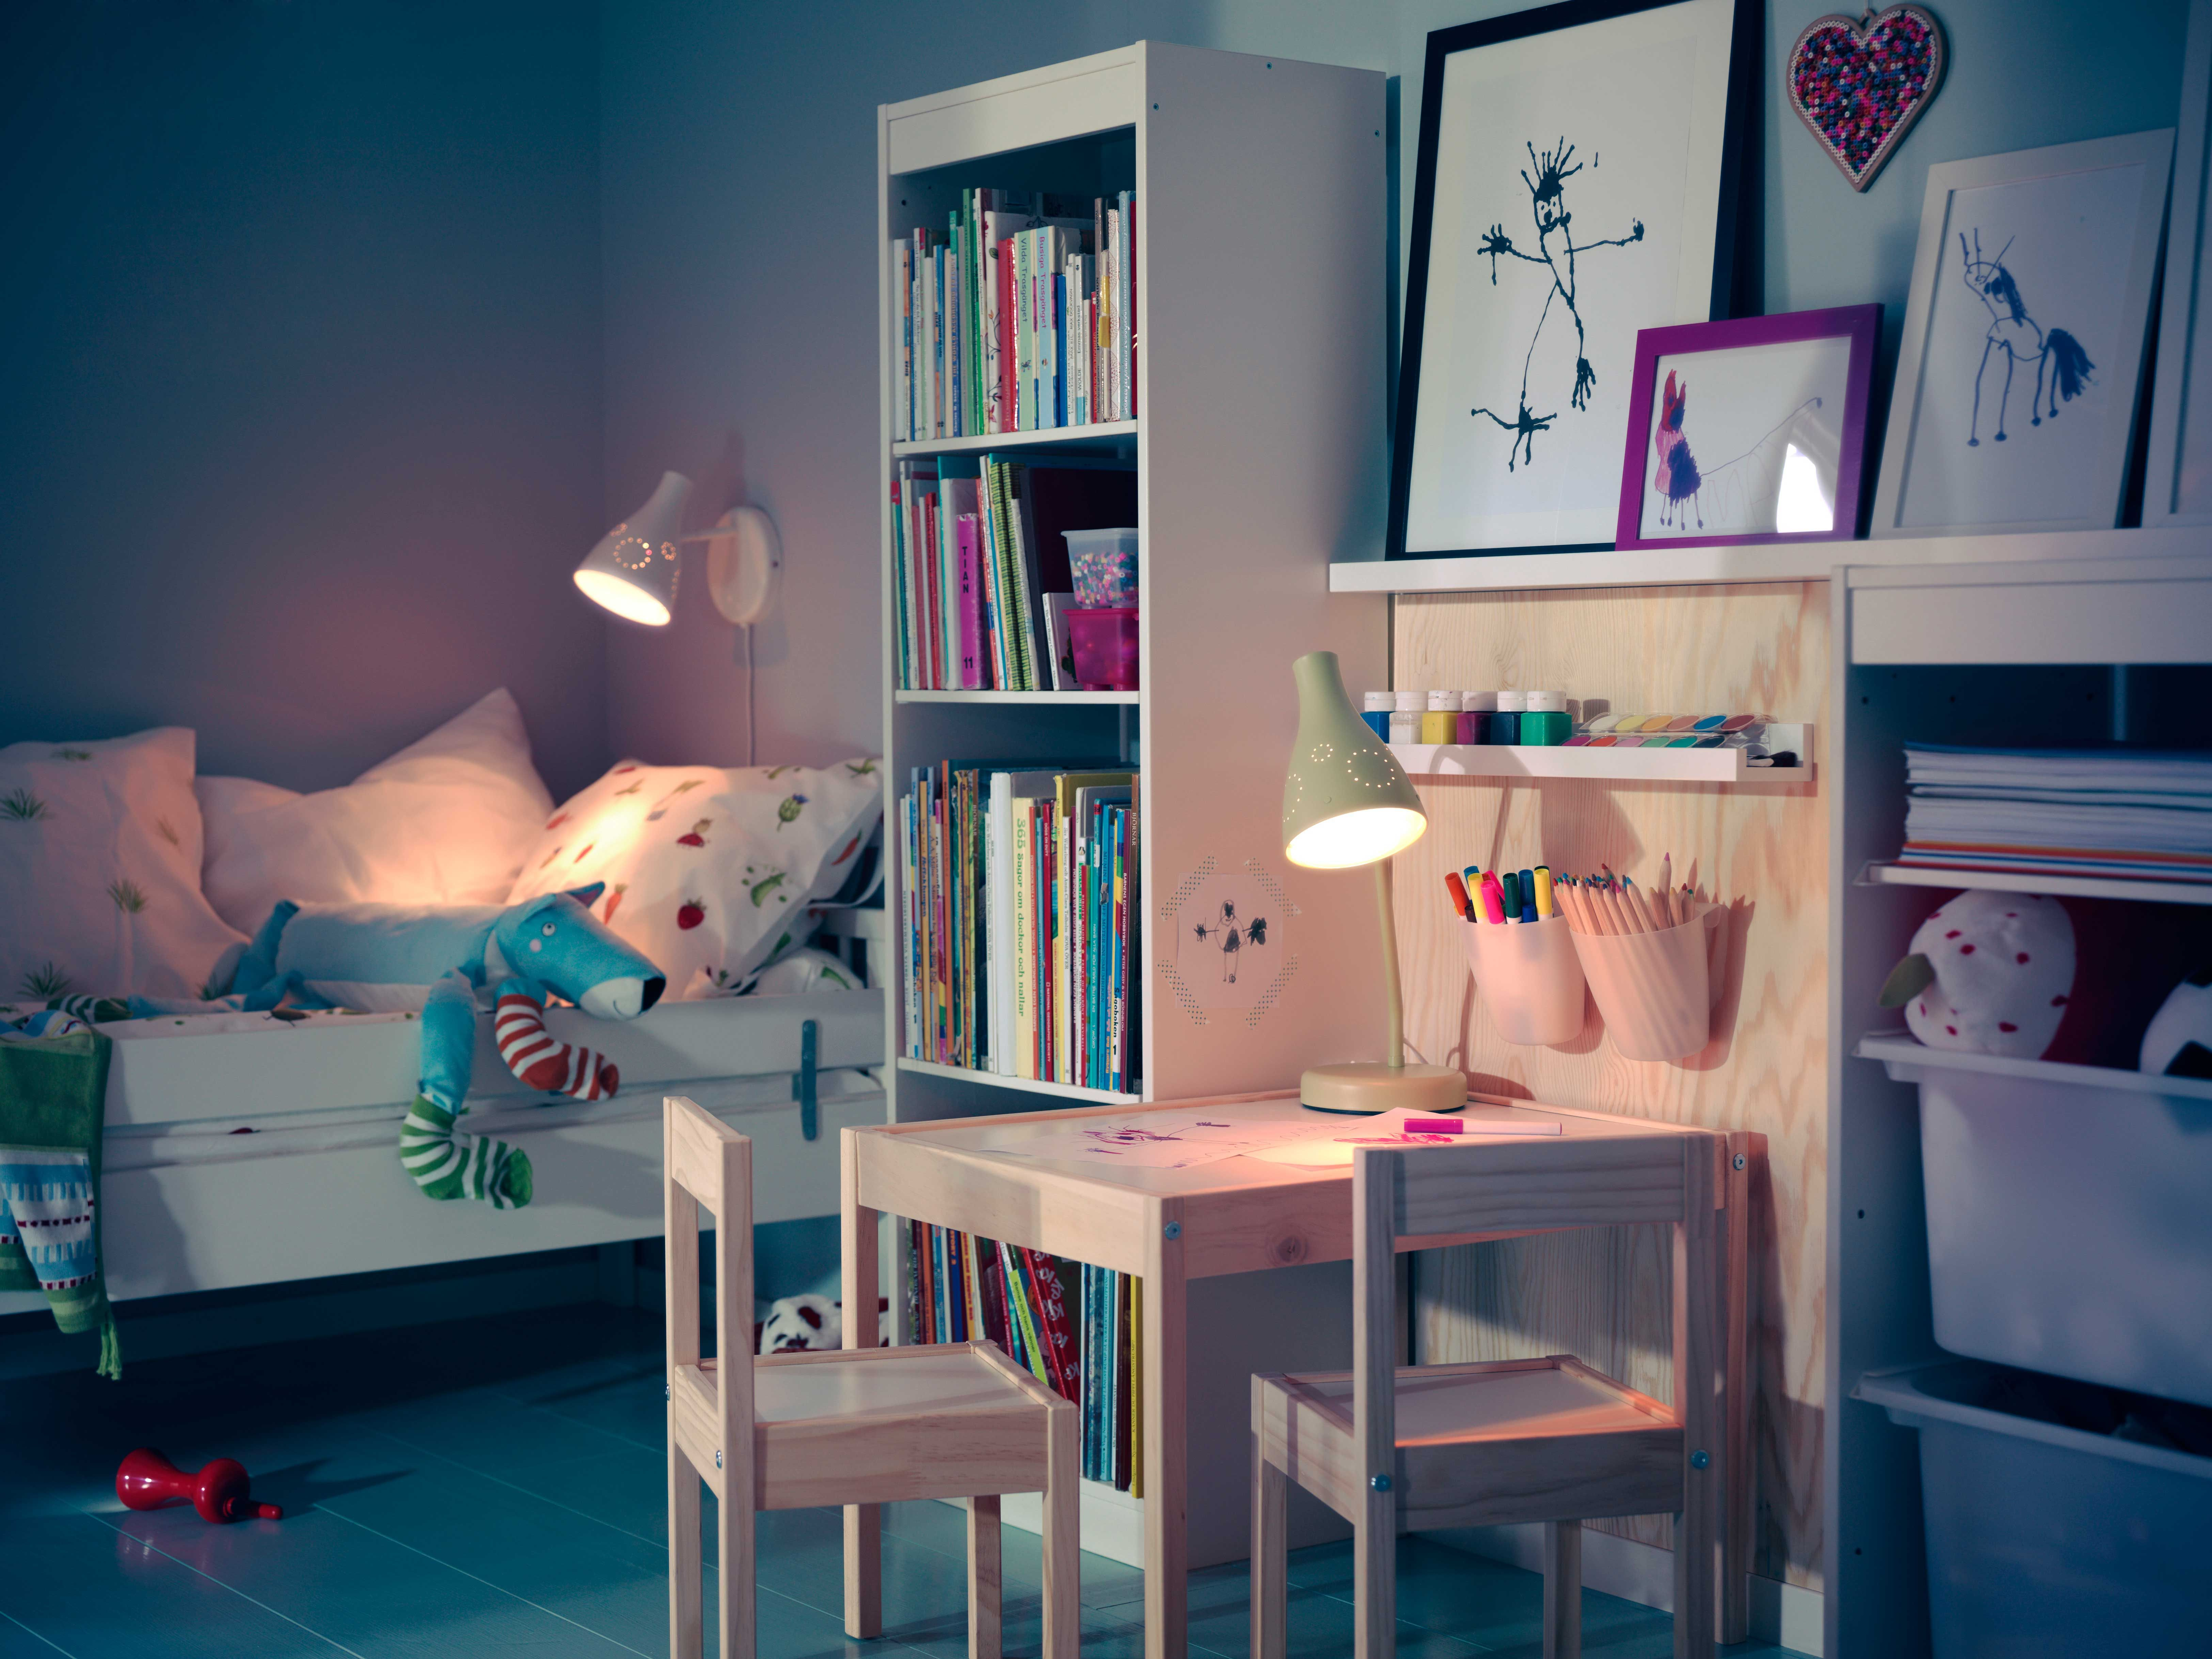 Ikea kinderzimmer trofast  IKEA Österreich, Inspiration, Kinder, Kids, Kindermöbel ...